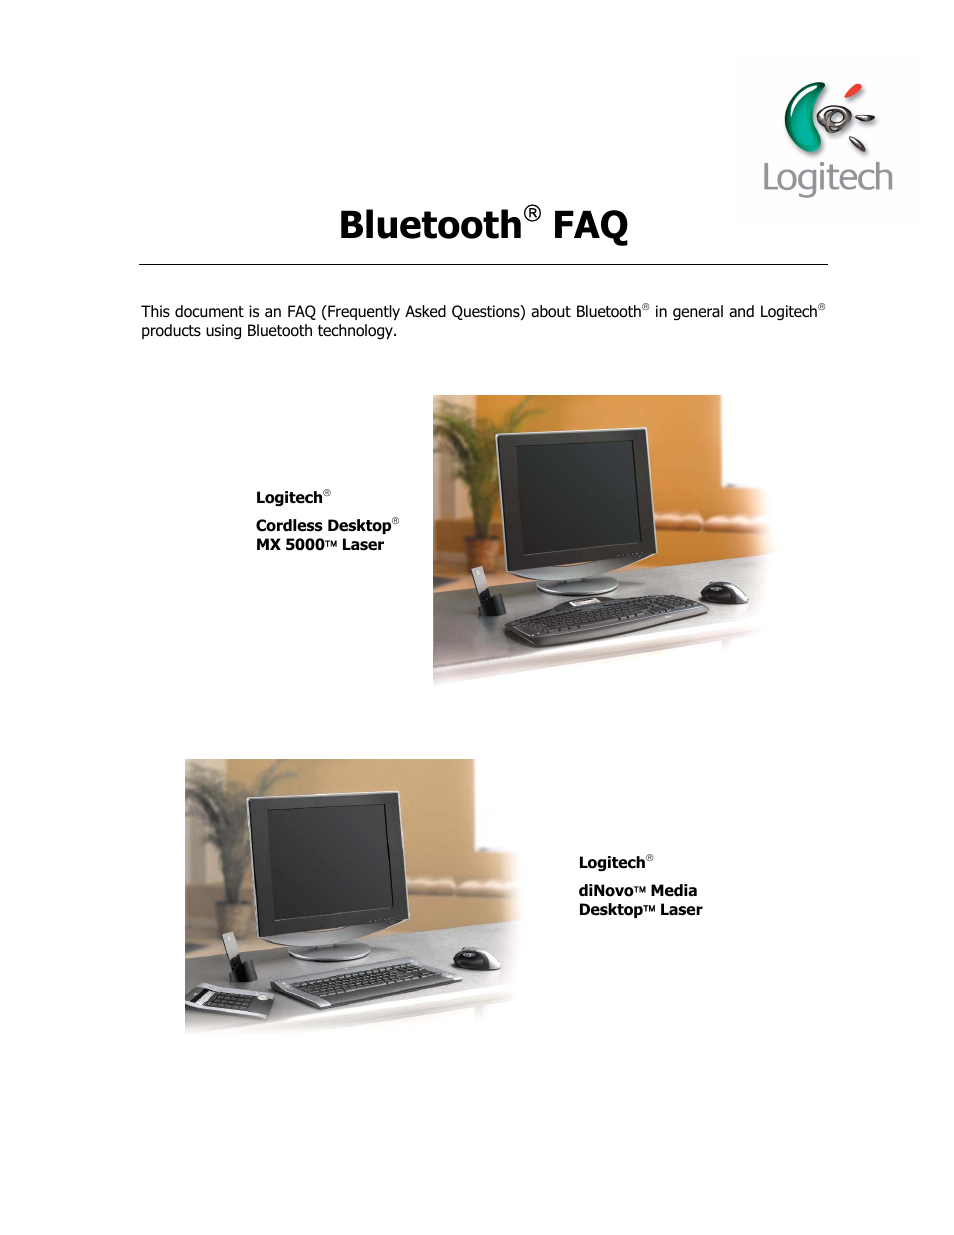 Cordless desktop® mx™ 5000 laser logitech support.